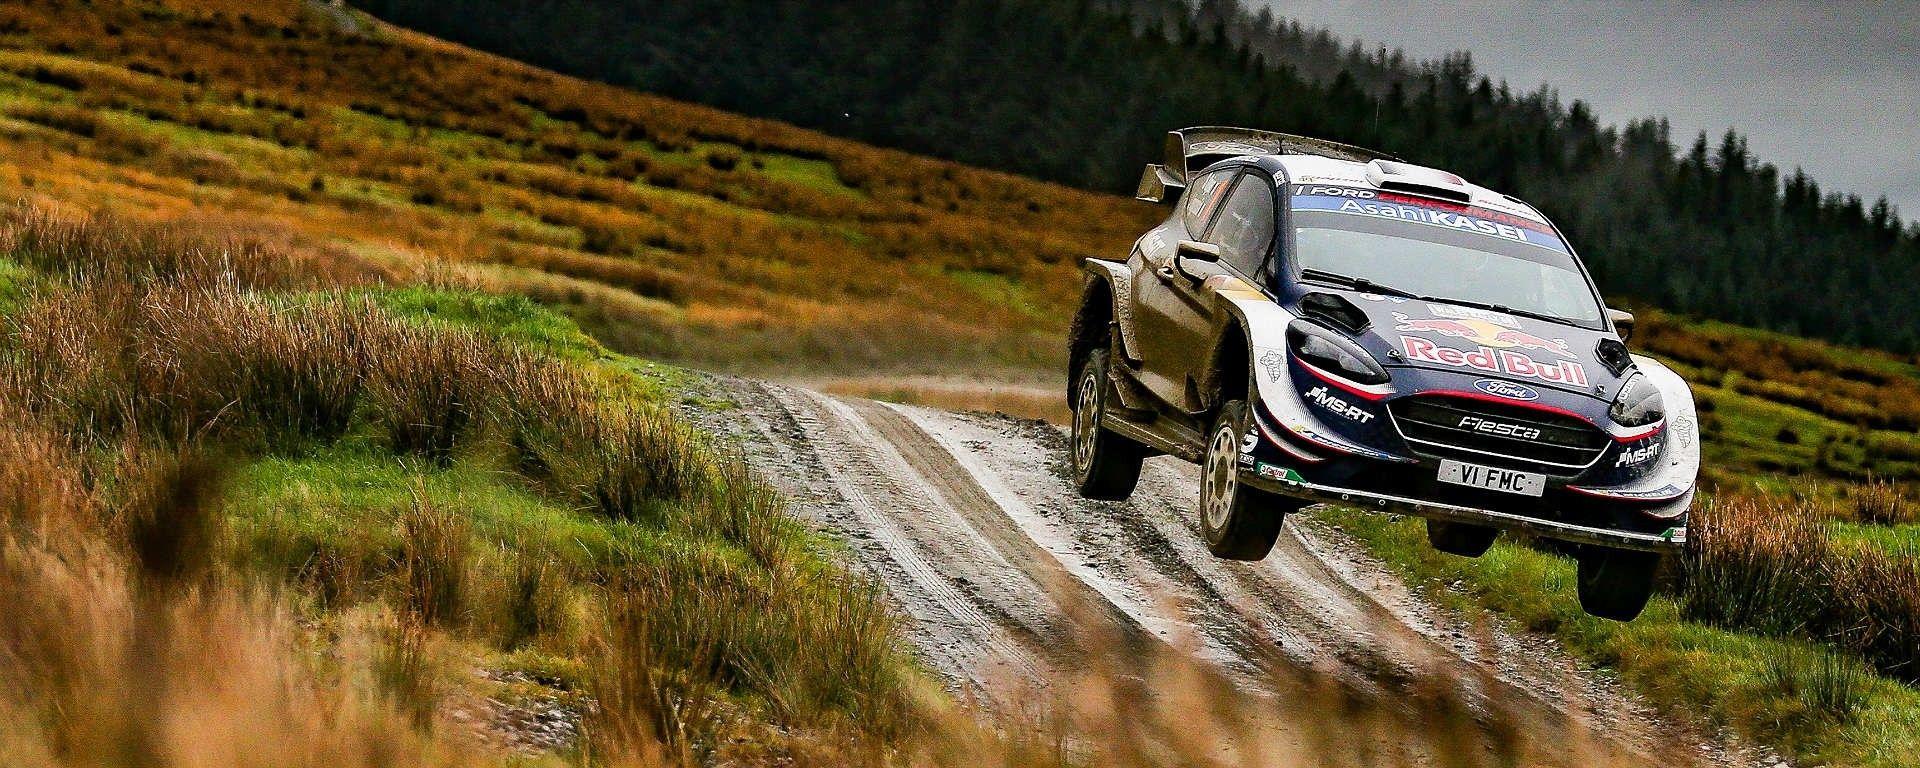 Sebastien Ogier sulla sua Ford M Sport